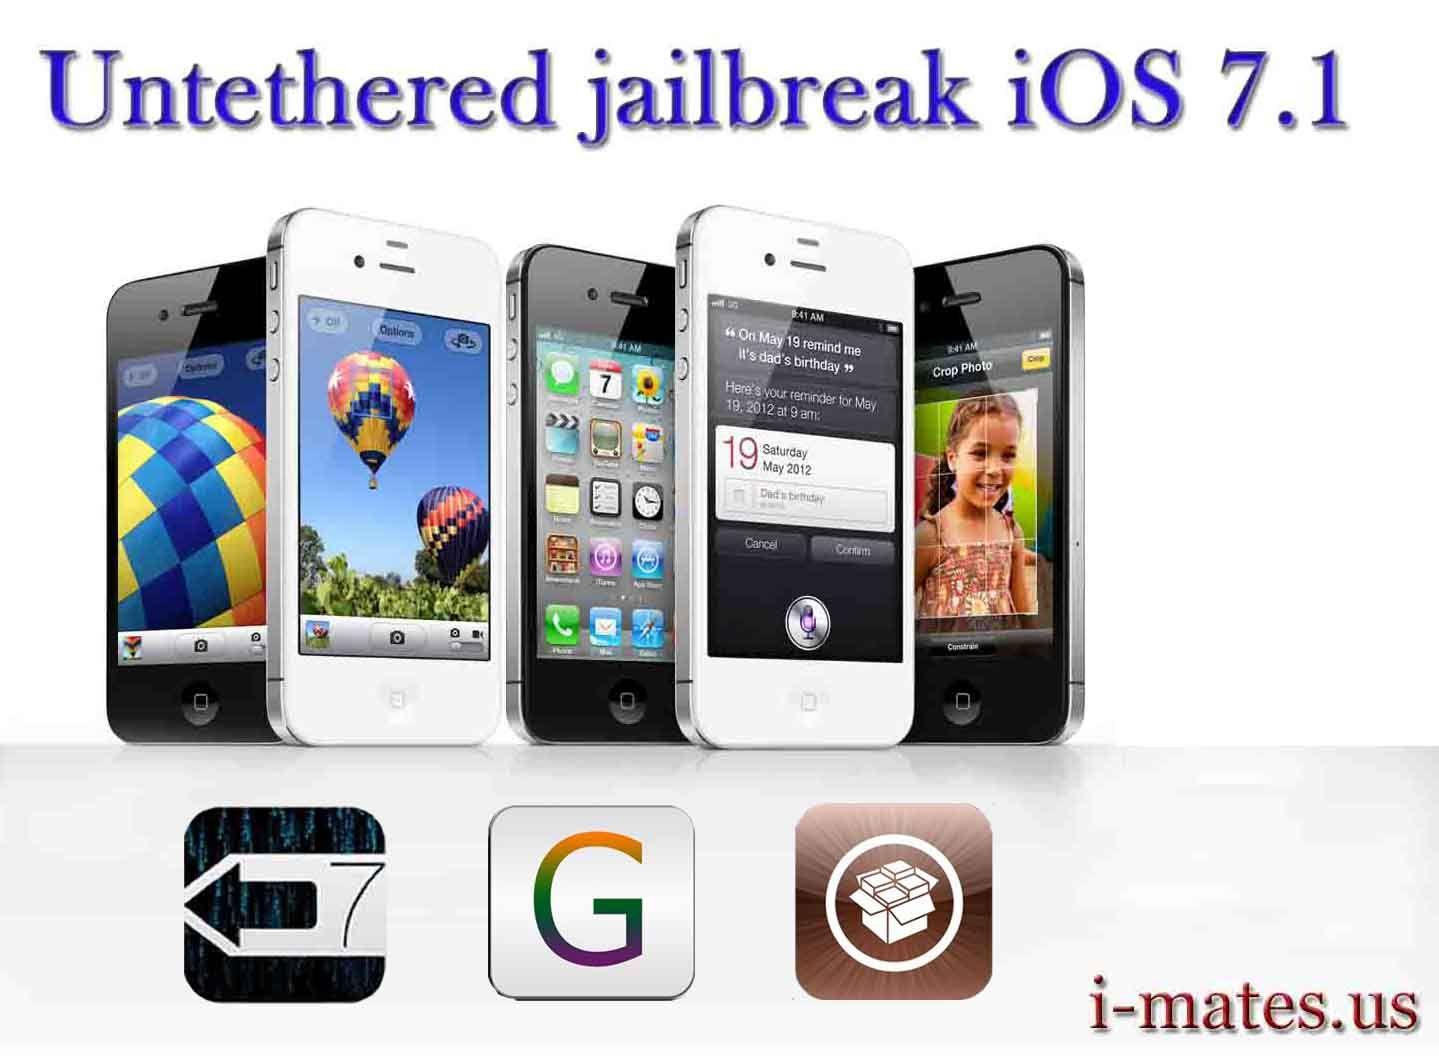 ios 7 jailbreak copy Iphone, Samsung galaxy s5